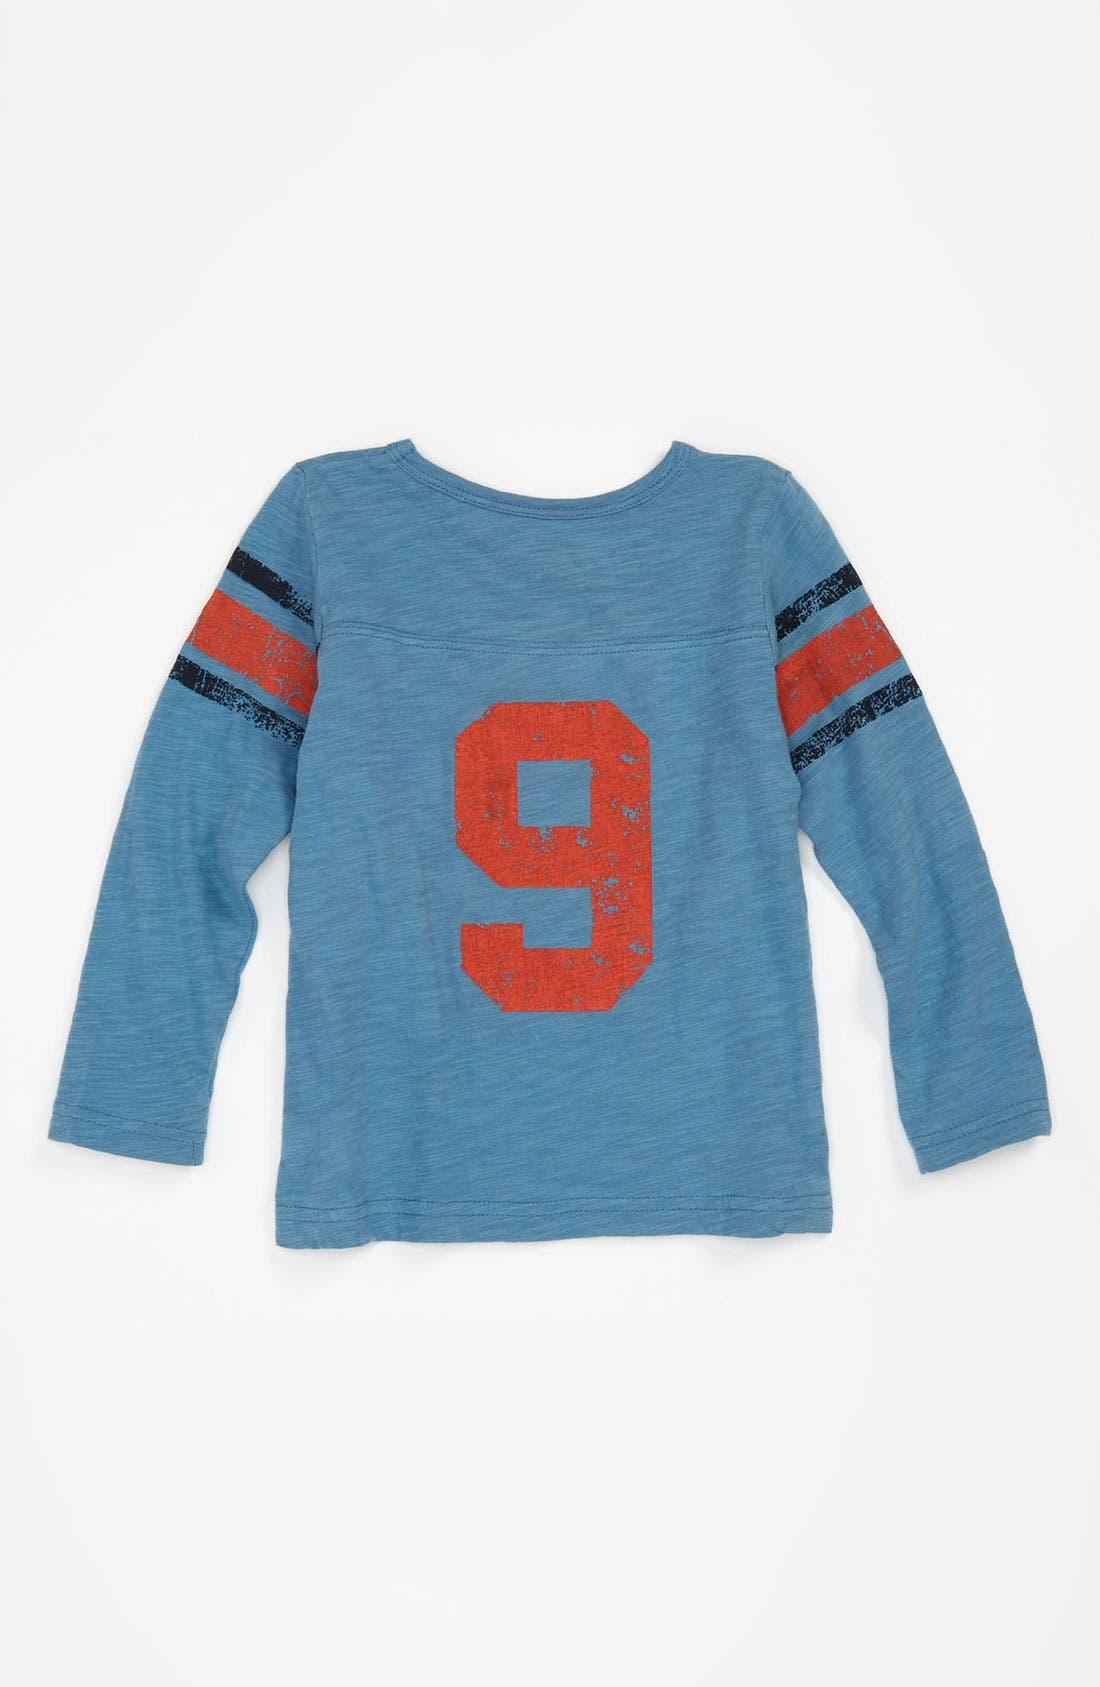 Alternate Image 2  - Peek Long Sleeve Jersey Top (Infant)